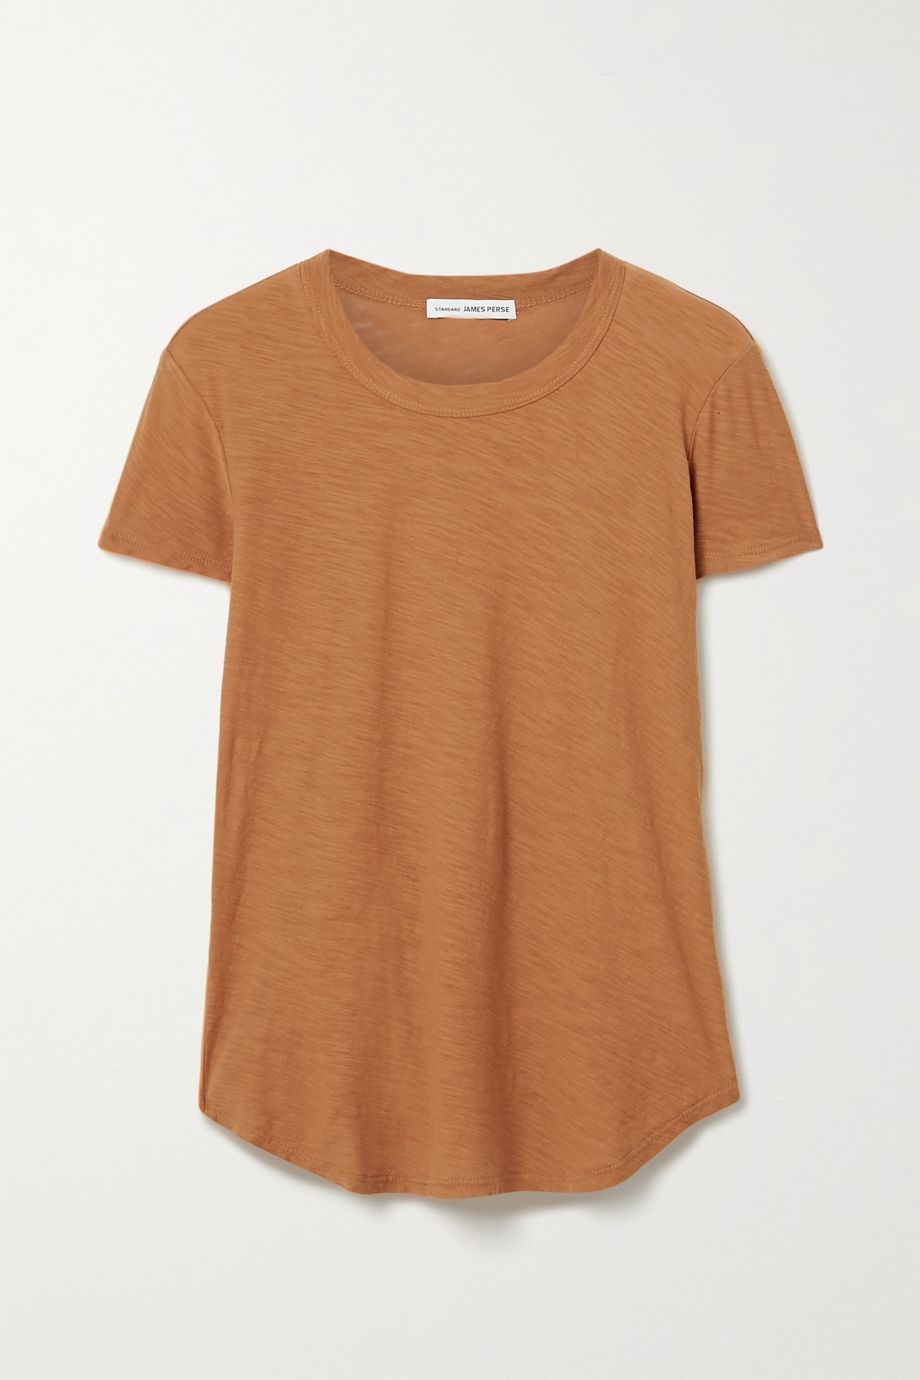 James Perse T-shirt en jersey de coton flammé